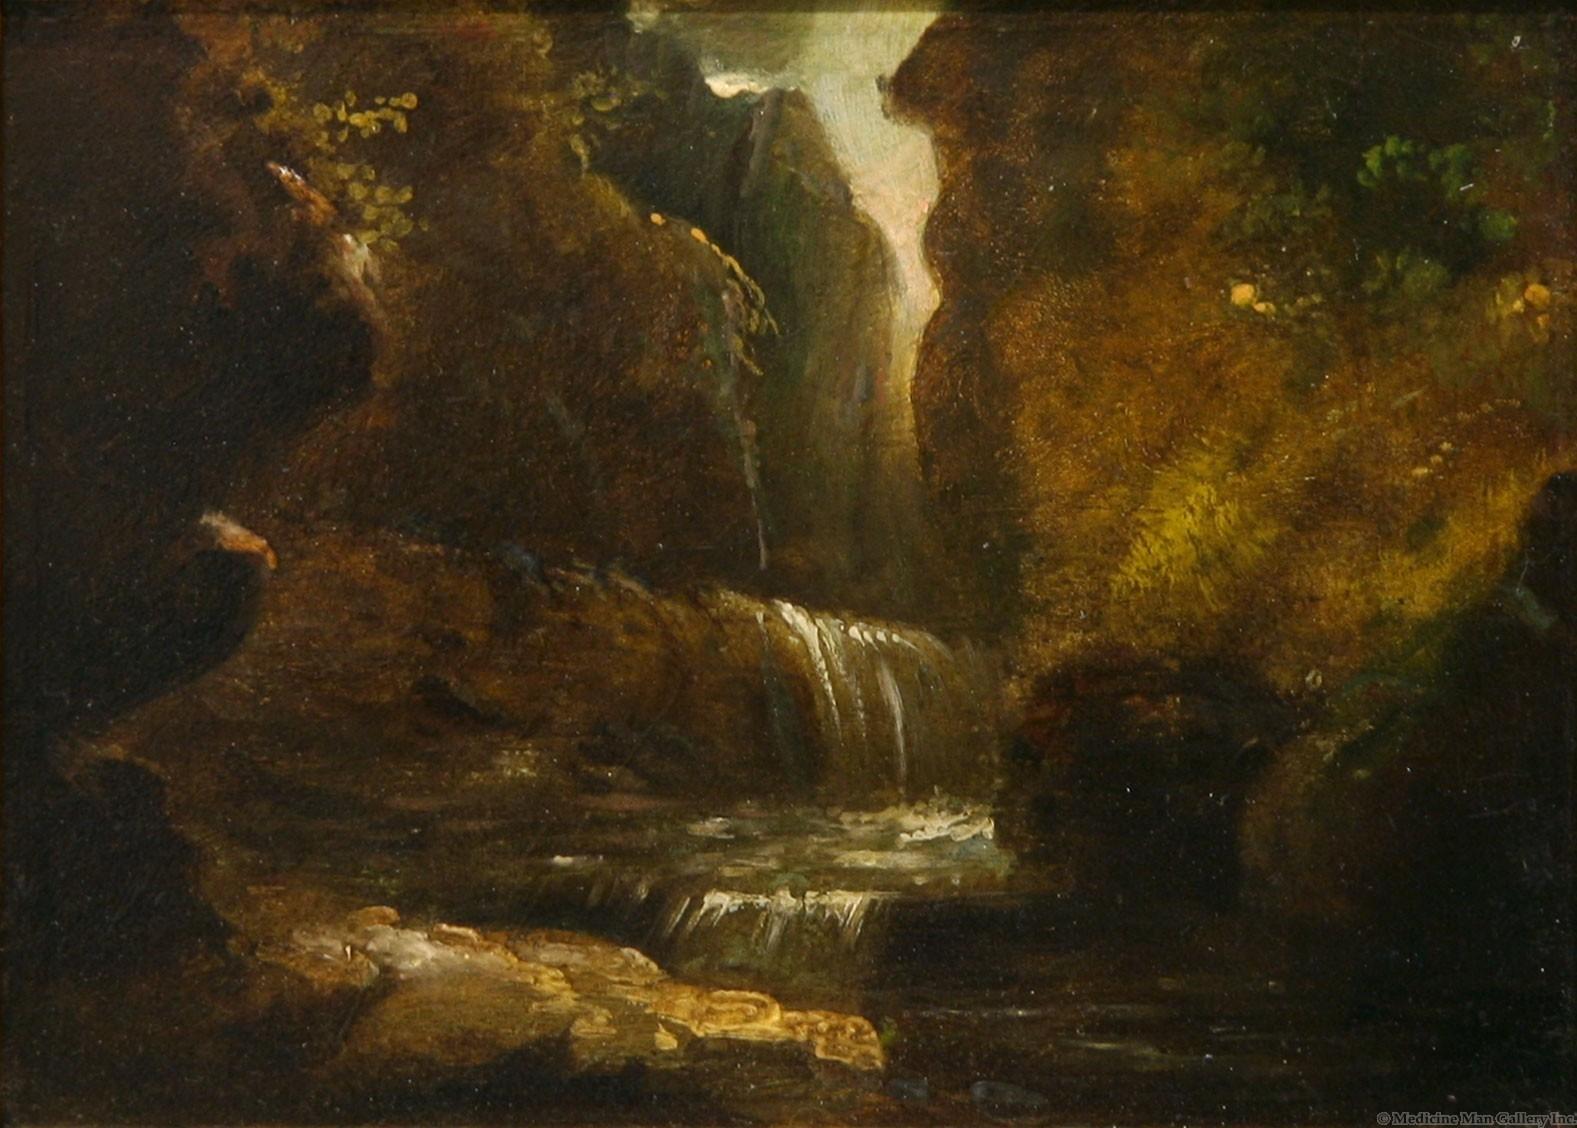 Miller, Alfred Jacob (1810-1874)